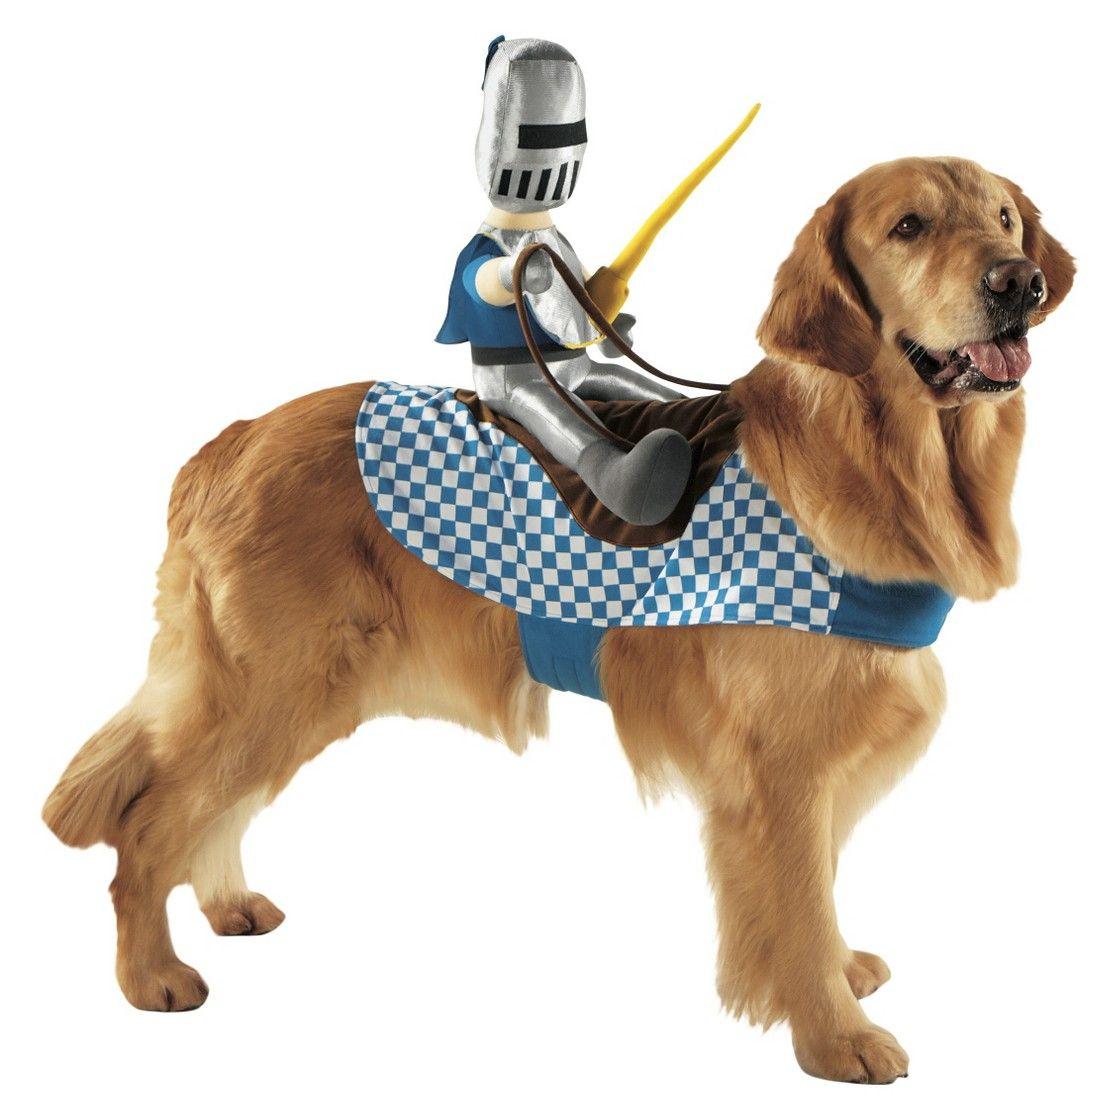 Knight Rider Pet Costume Pet Costumes Knight Rider Pets